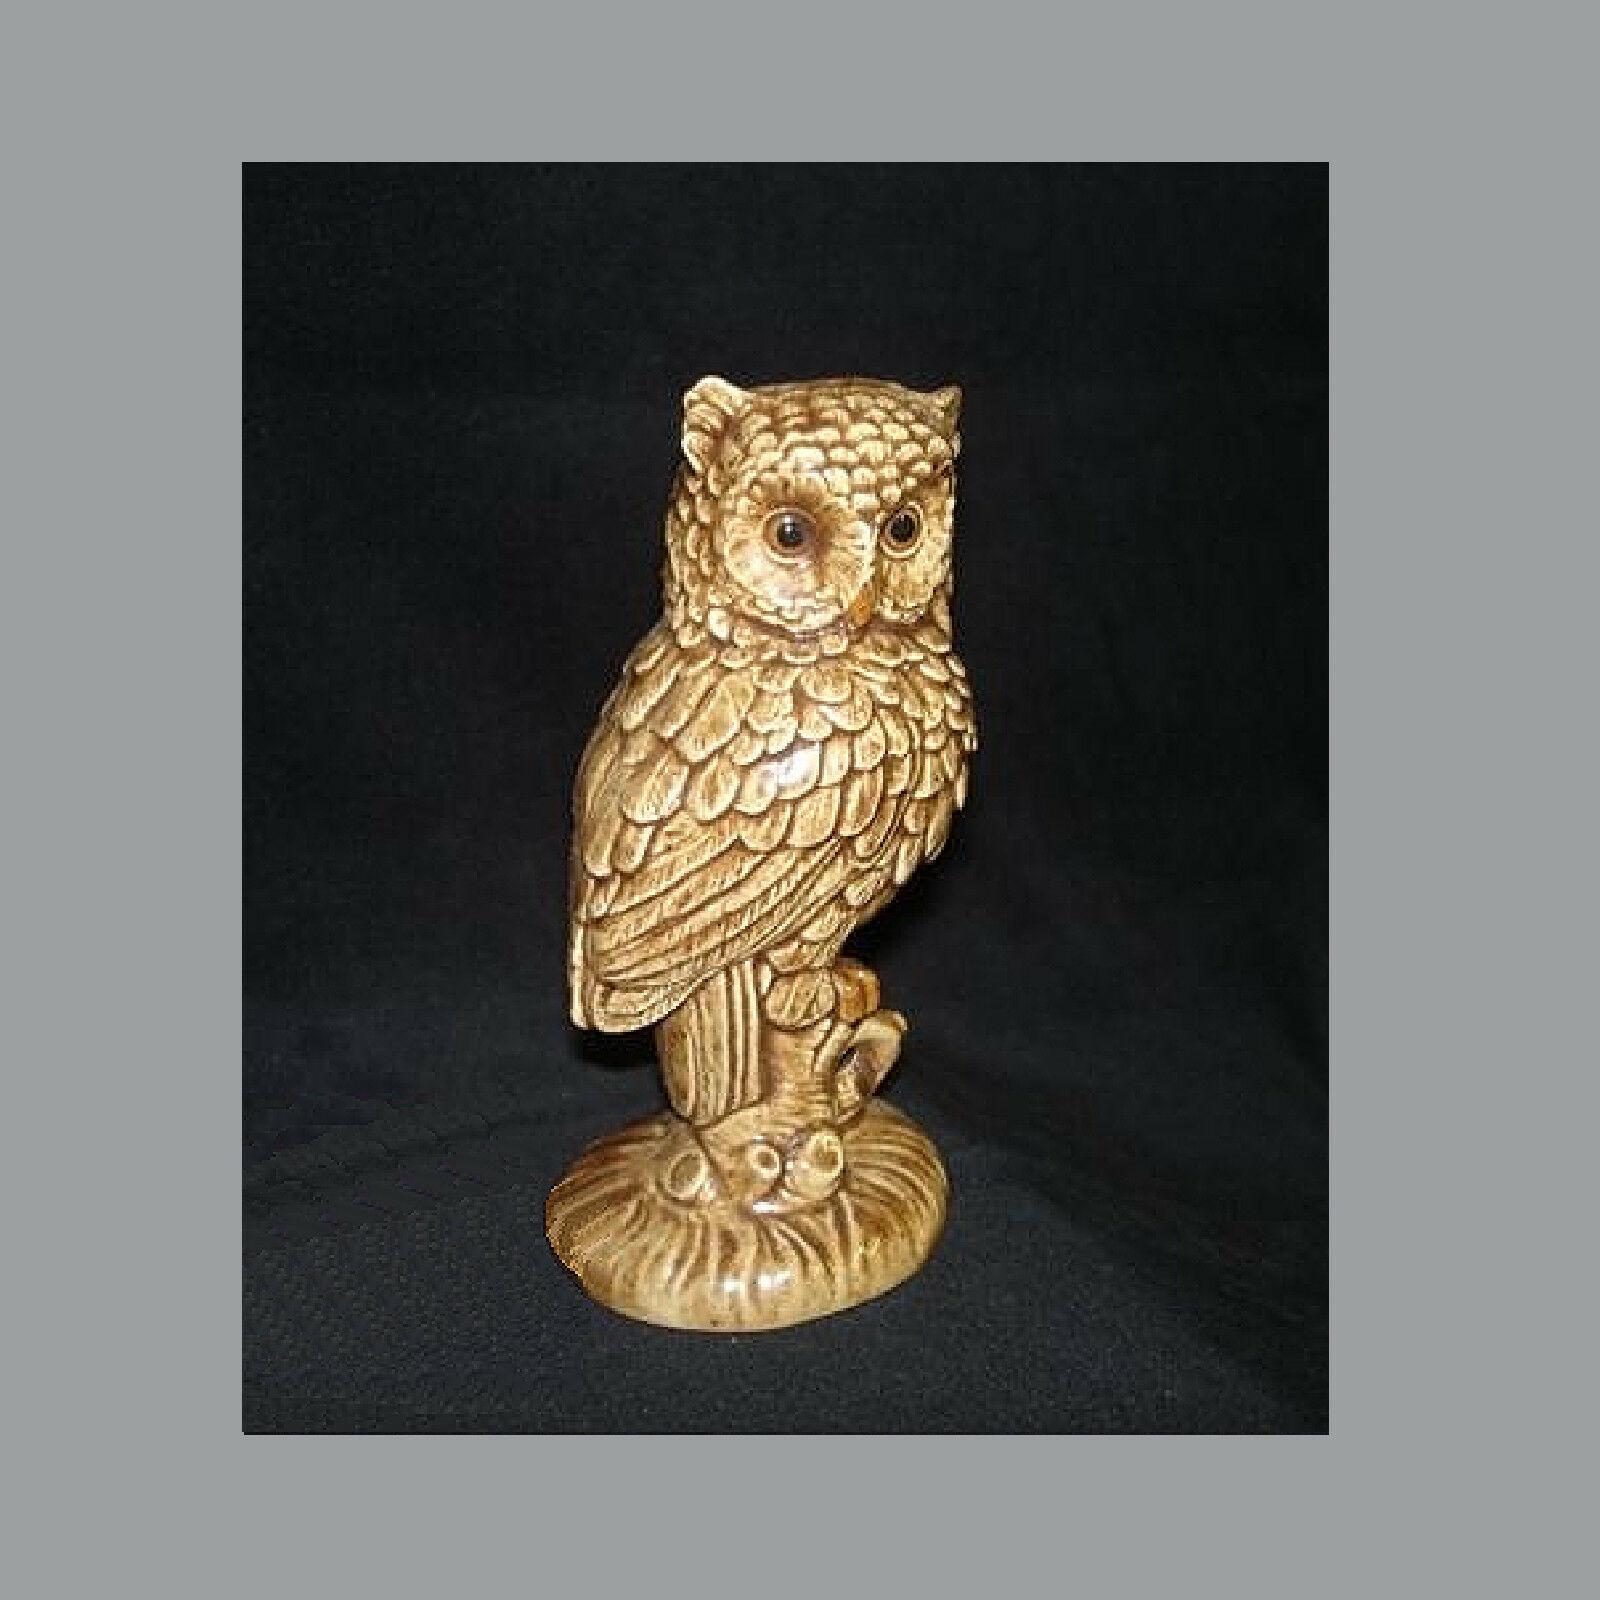 Vintage Mid-Century Perched Owl Figurine Ceramic